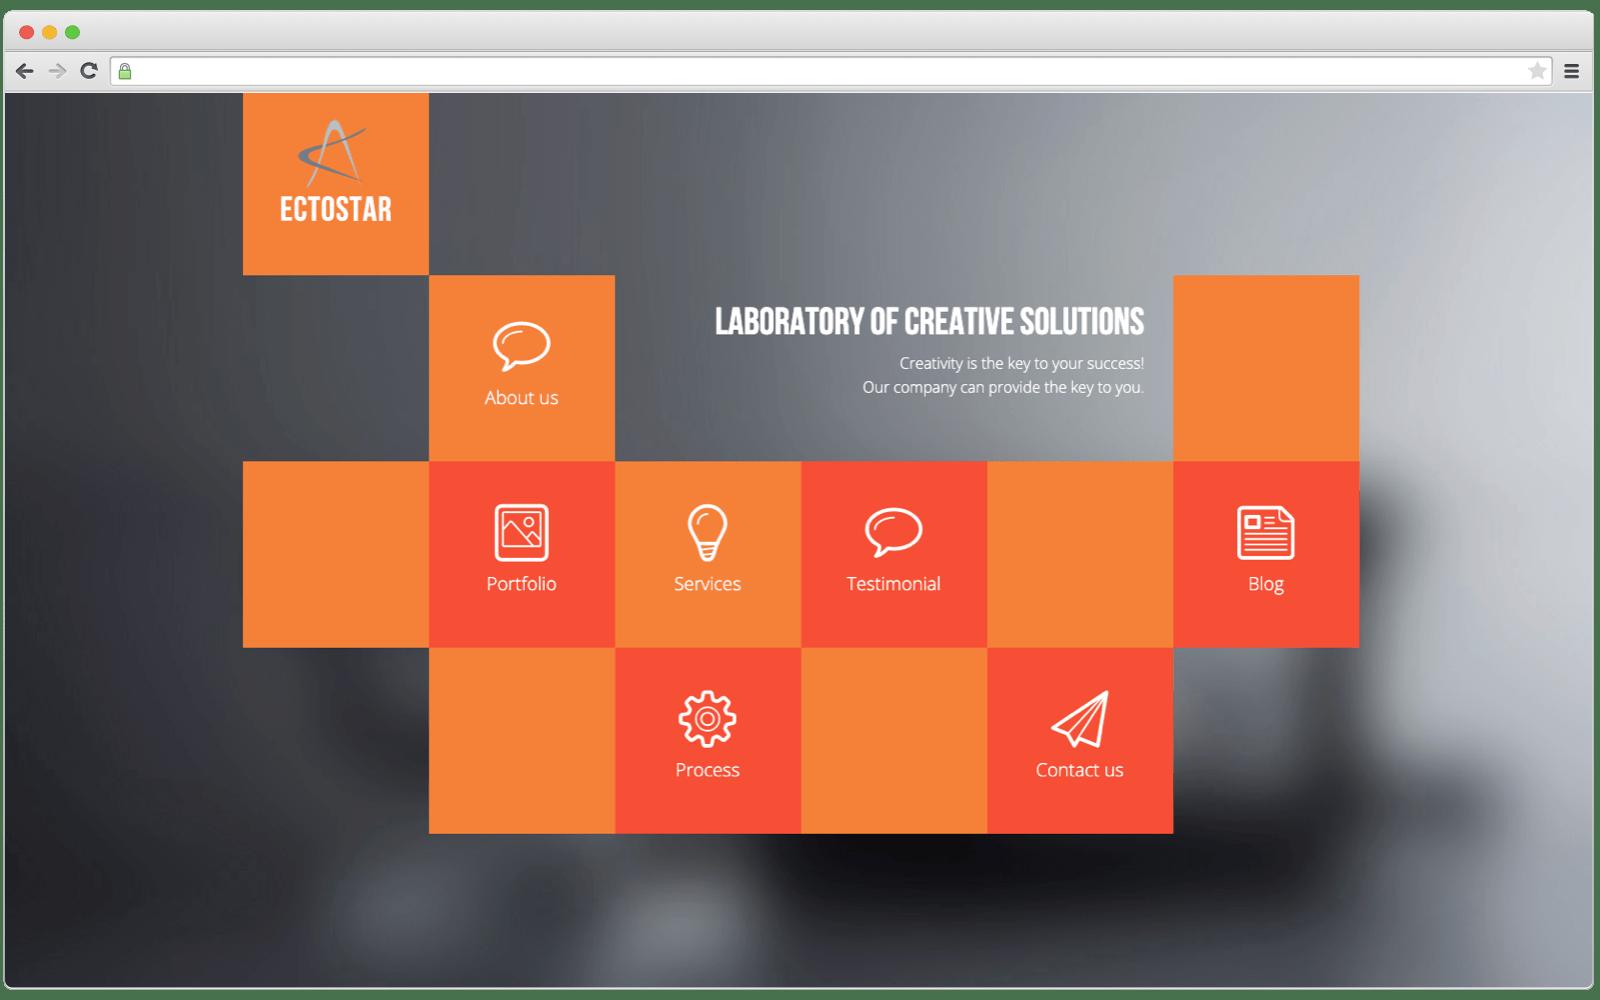 Software development companies in Toronto: EctoStar